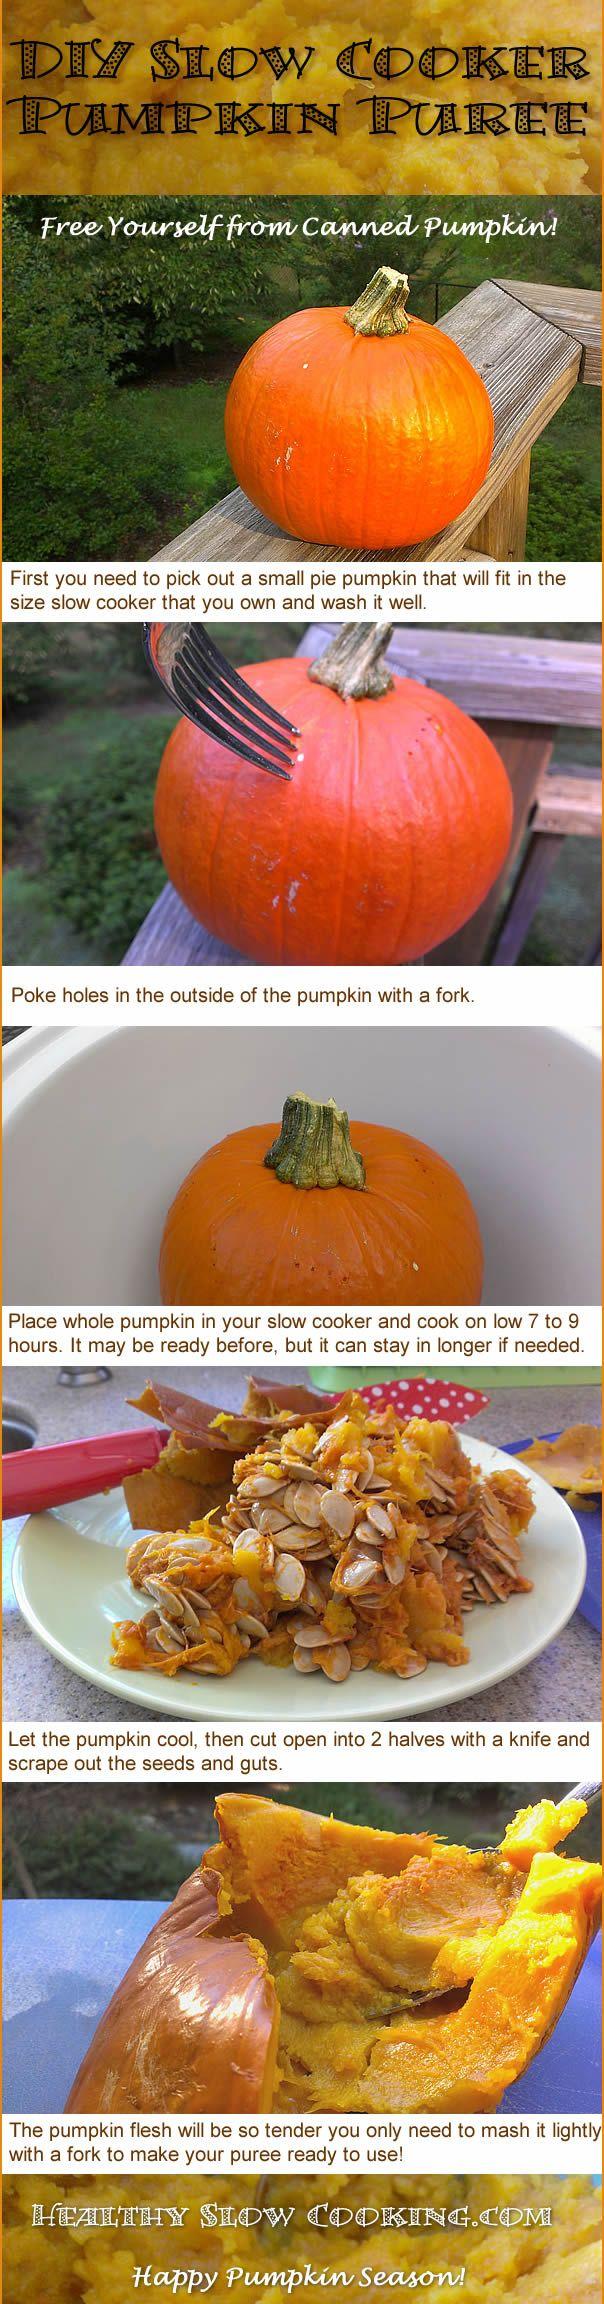 Step by Step Slow Cooker Pumpkin Purée -